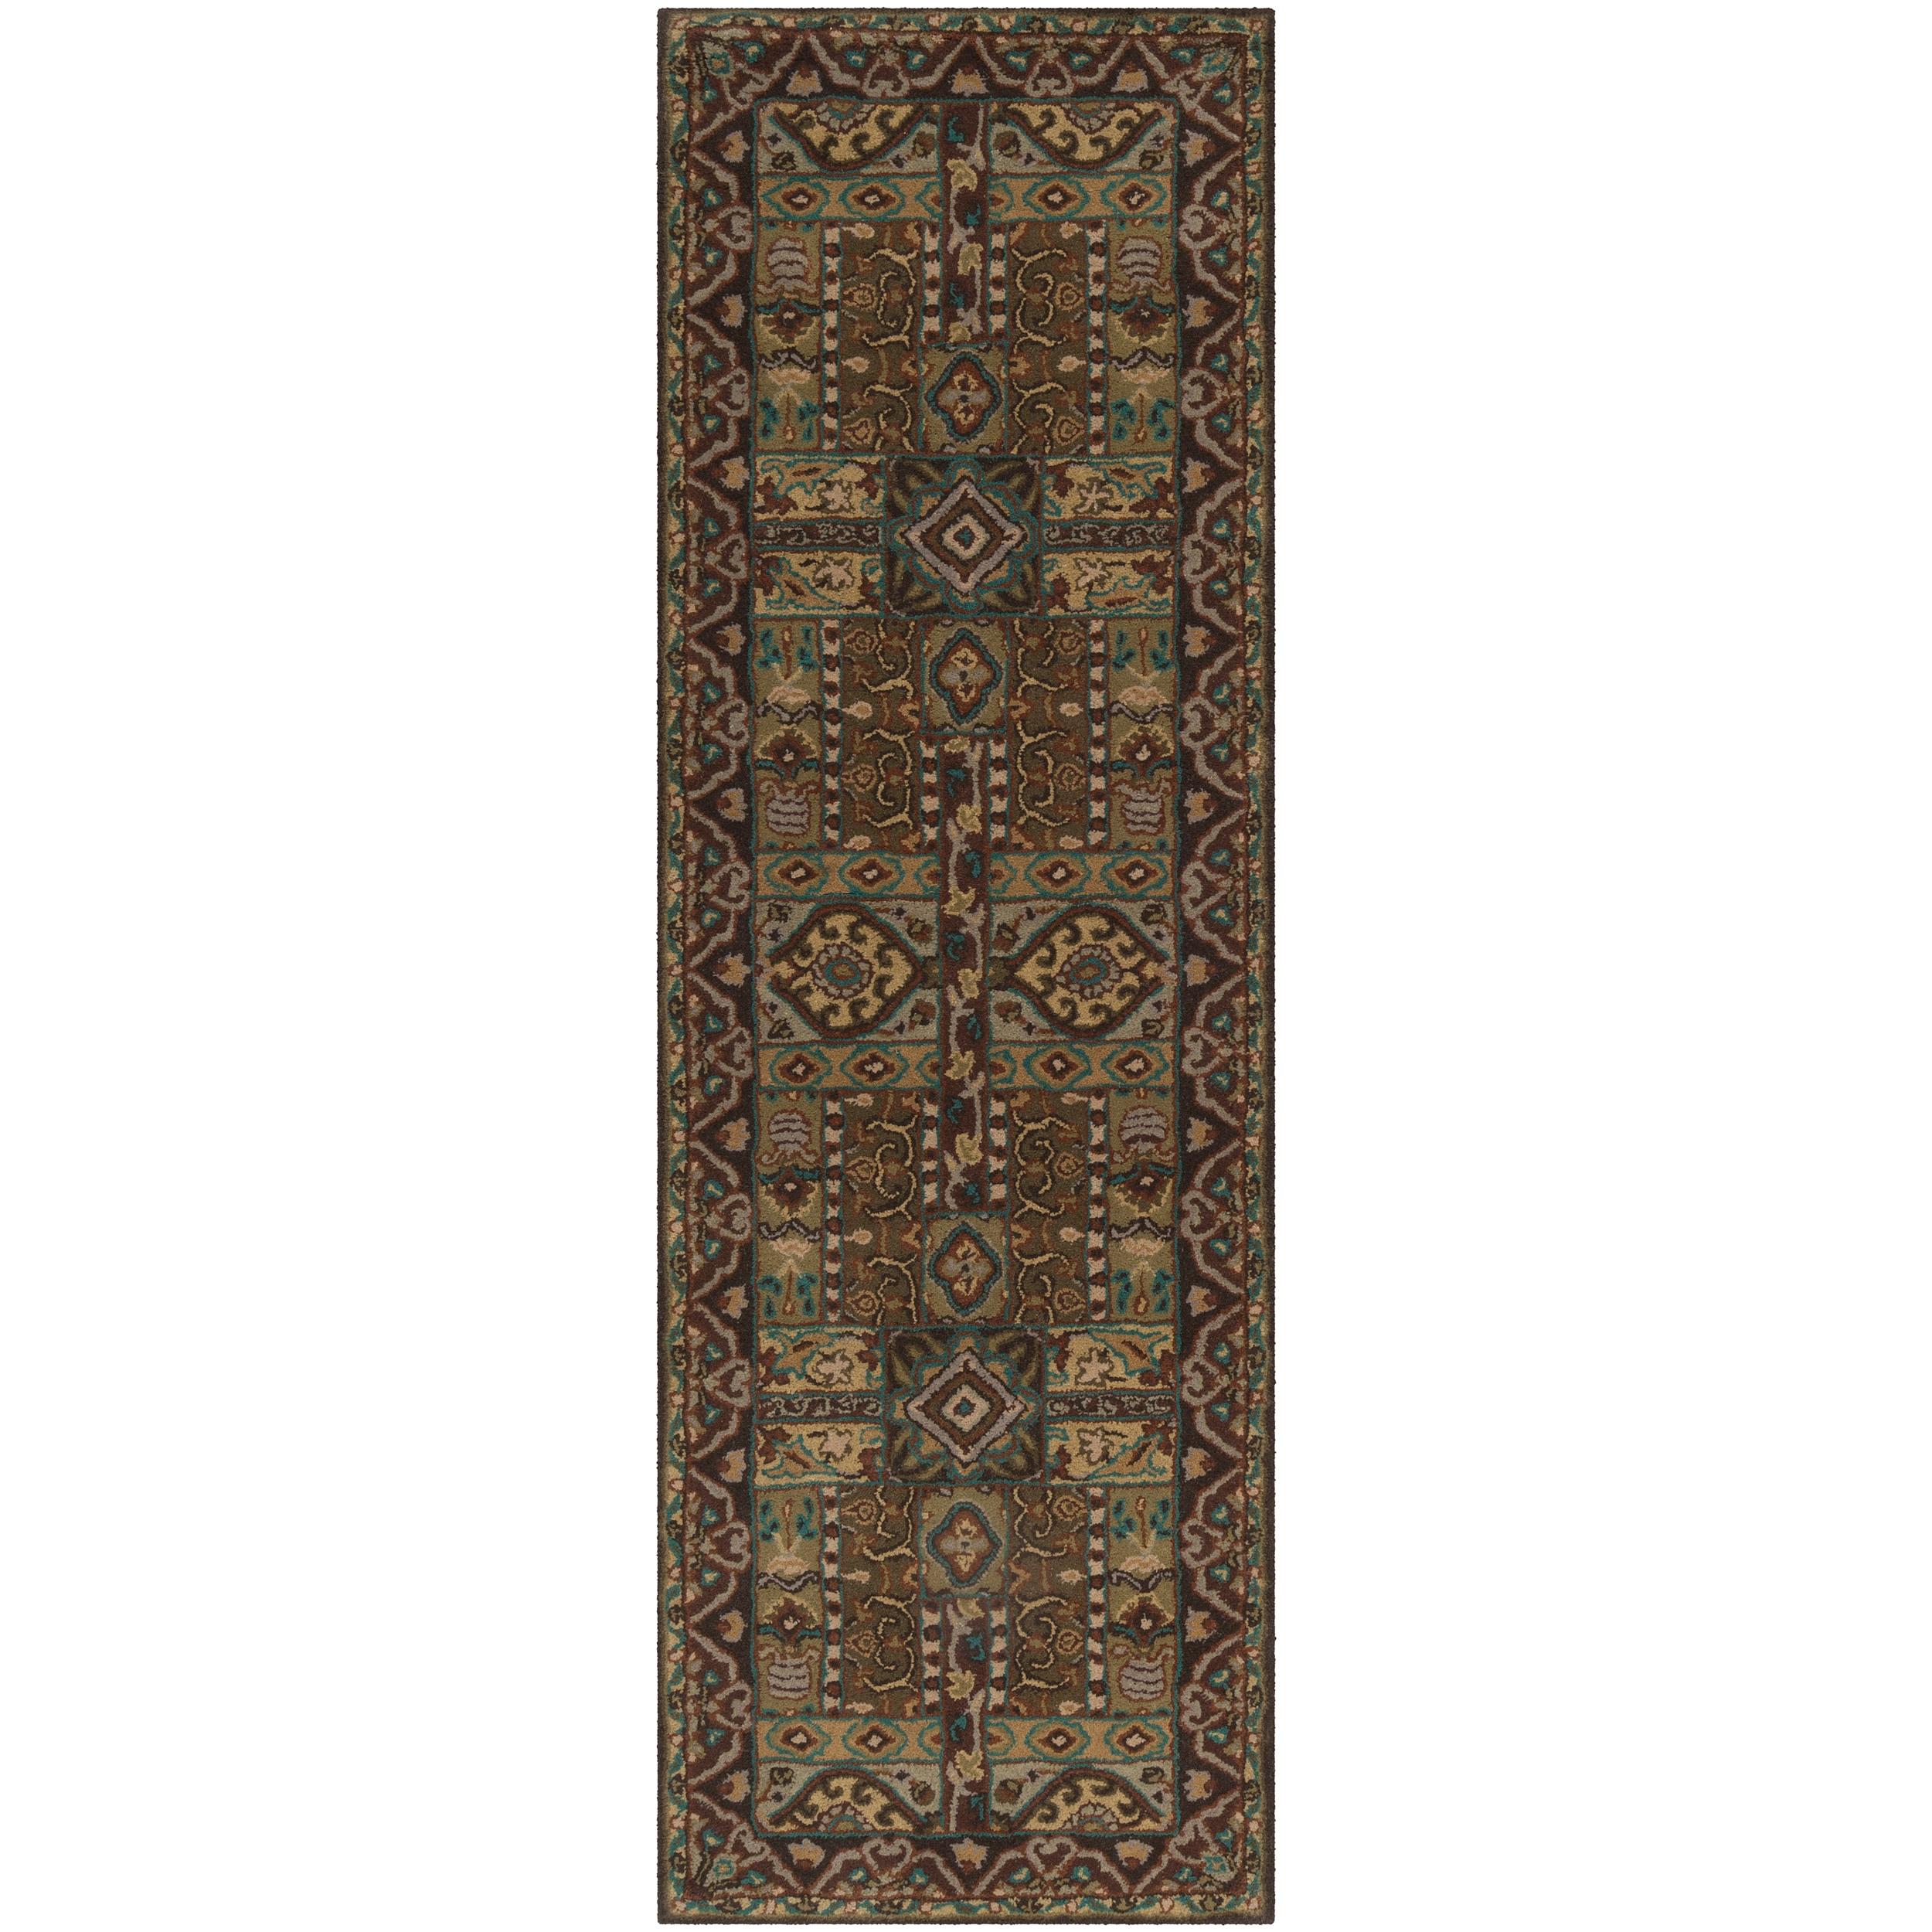 Hand-tufted Kiser Brown Wool Rug (3' x 12'), Size 3' x 12'